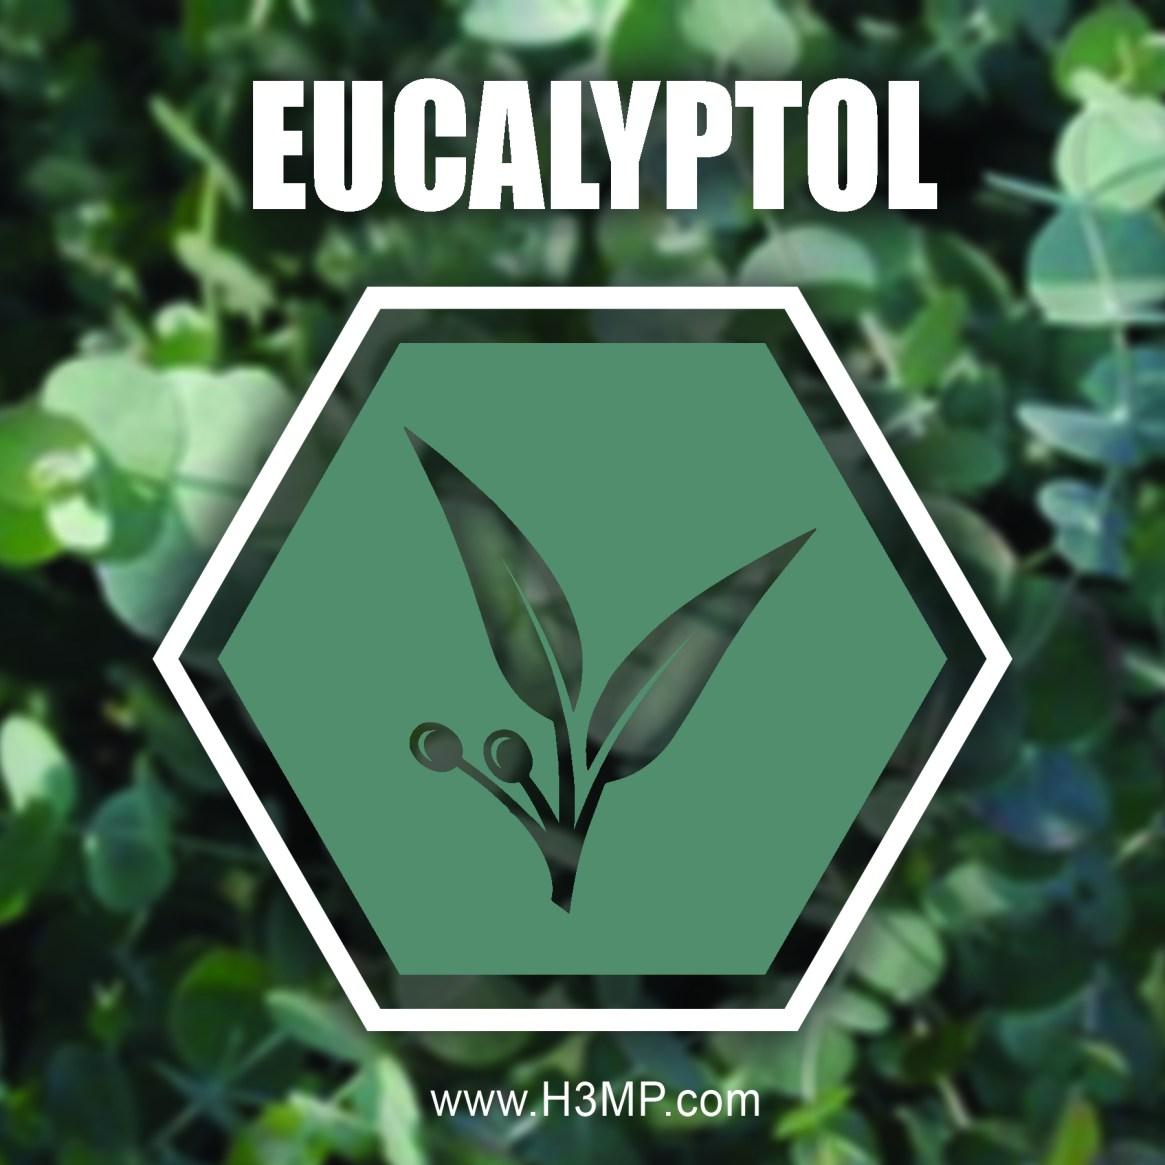 H3MP EUCALYPTOL